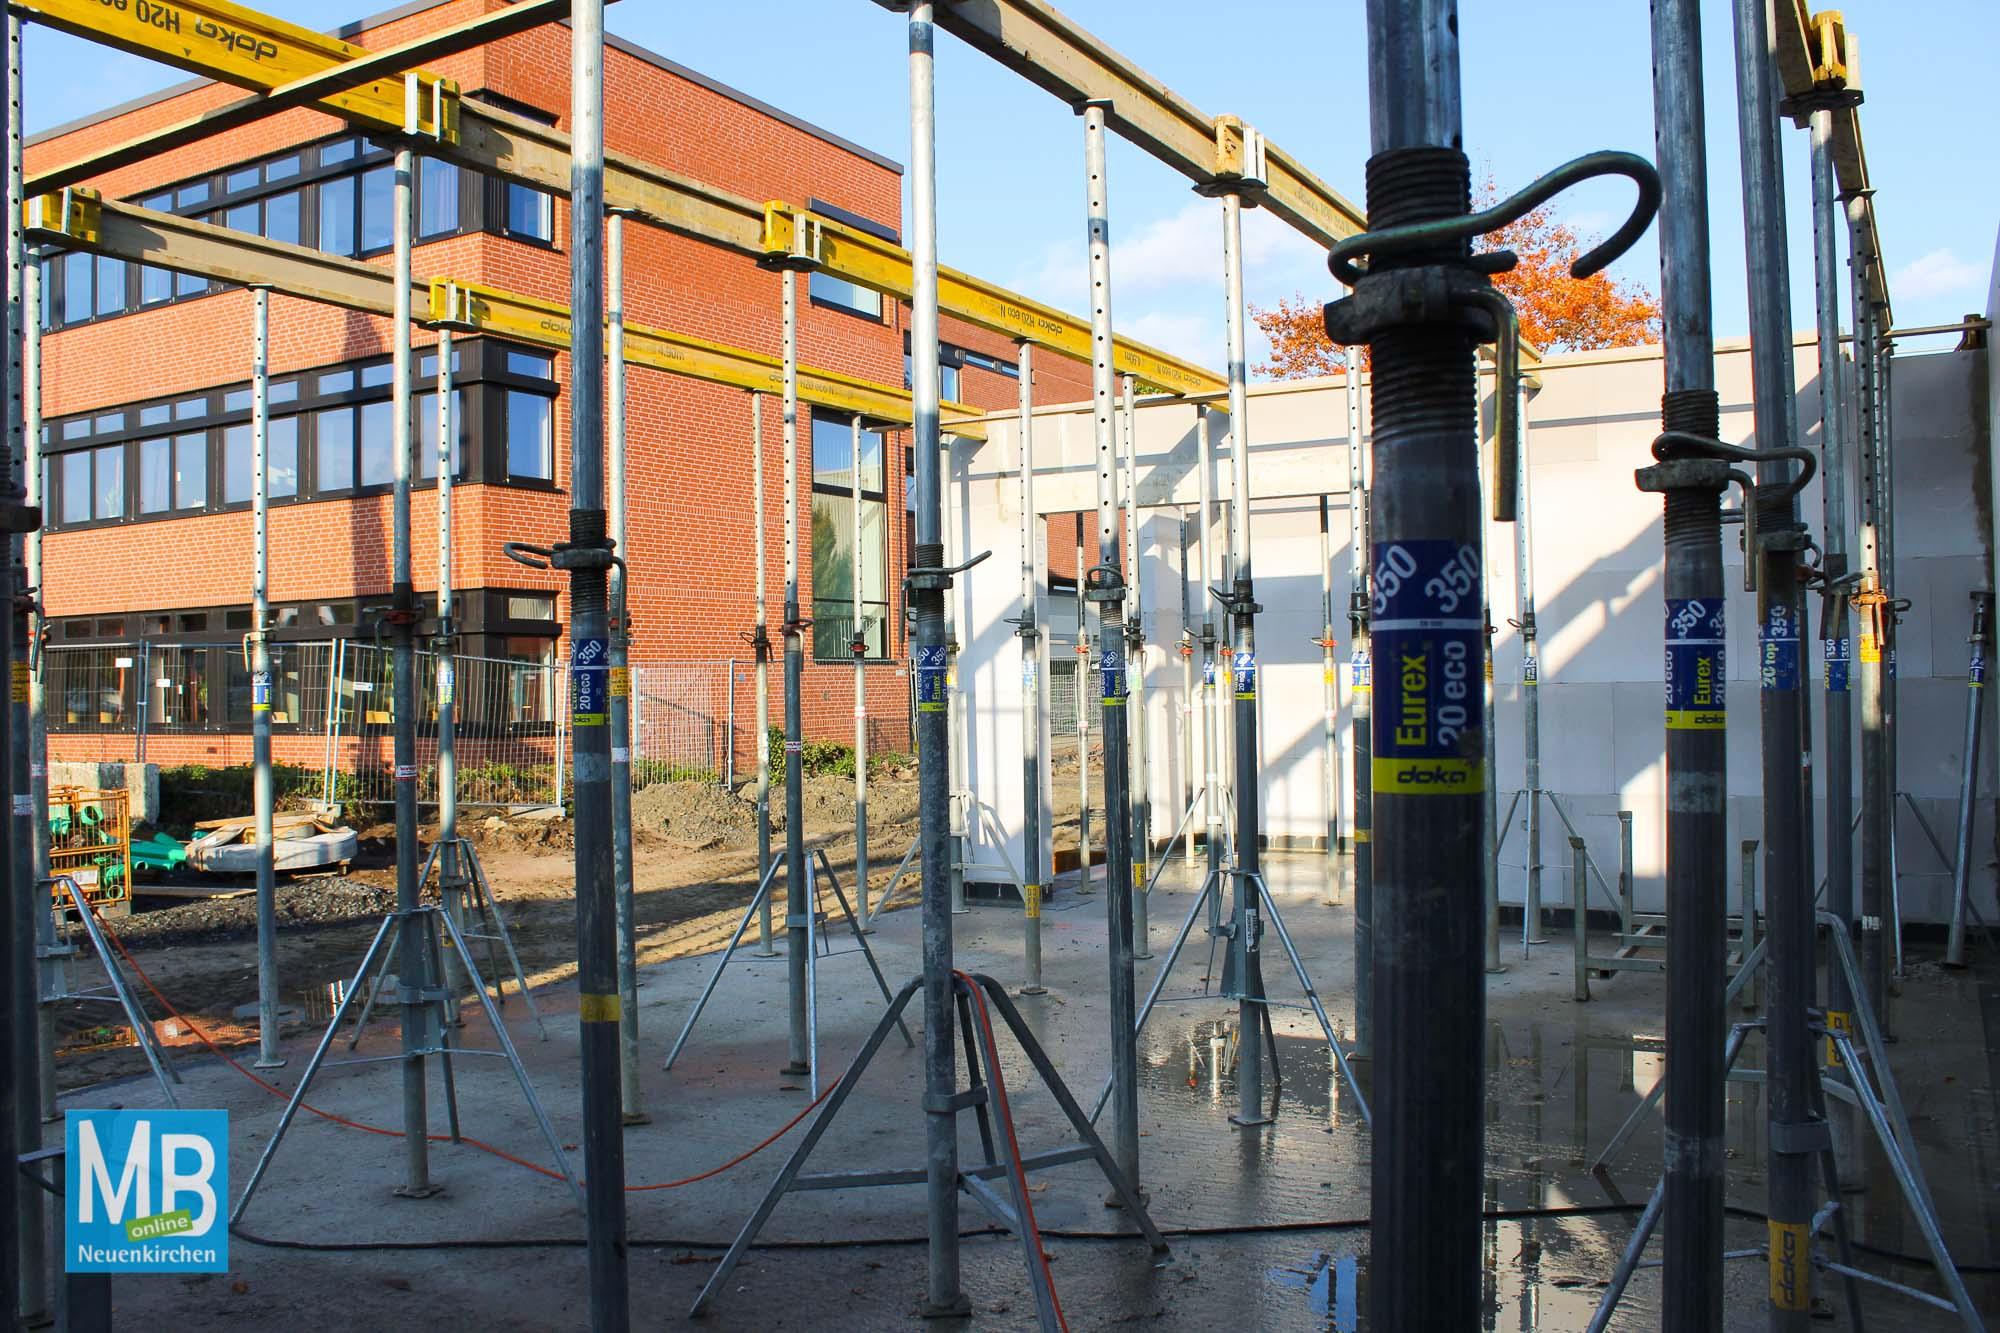 Baustellenbesichtigung: ENS-Mensa. | Foto: Lea Helene Kaumanns